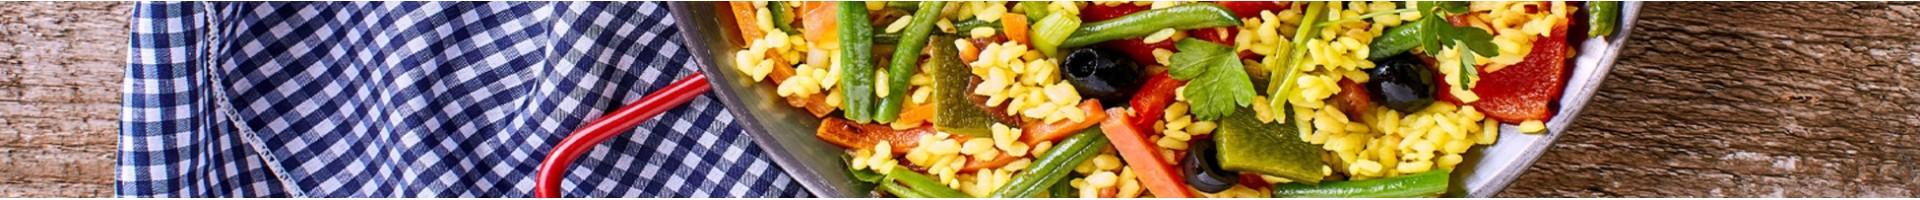 Comida Preparada: Pizza Vegana, Kebab Vegano | La Finestra